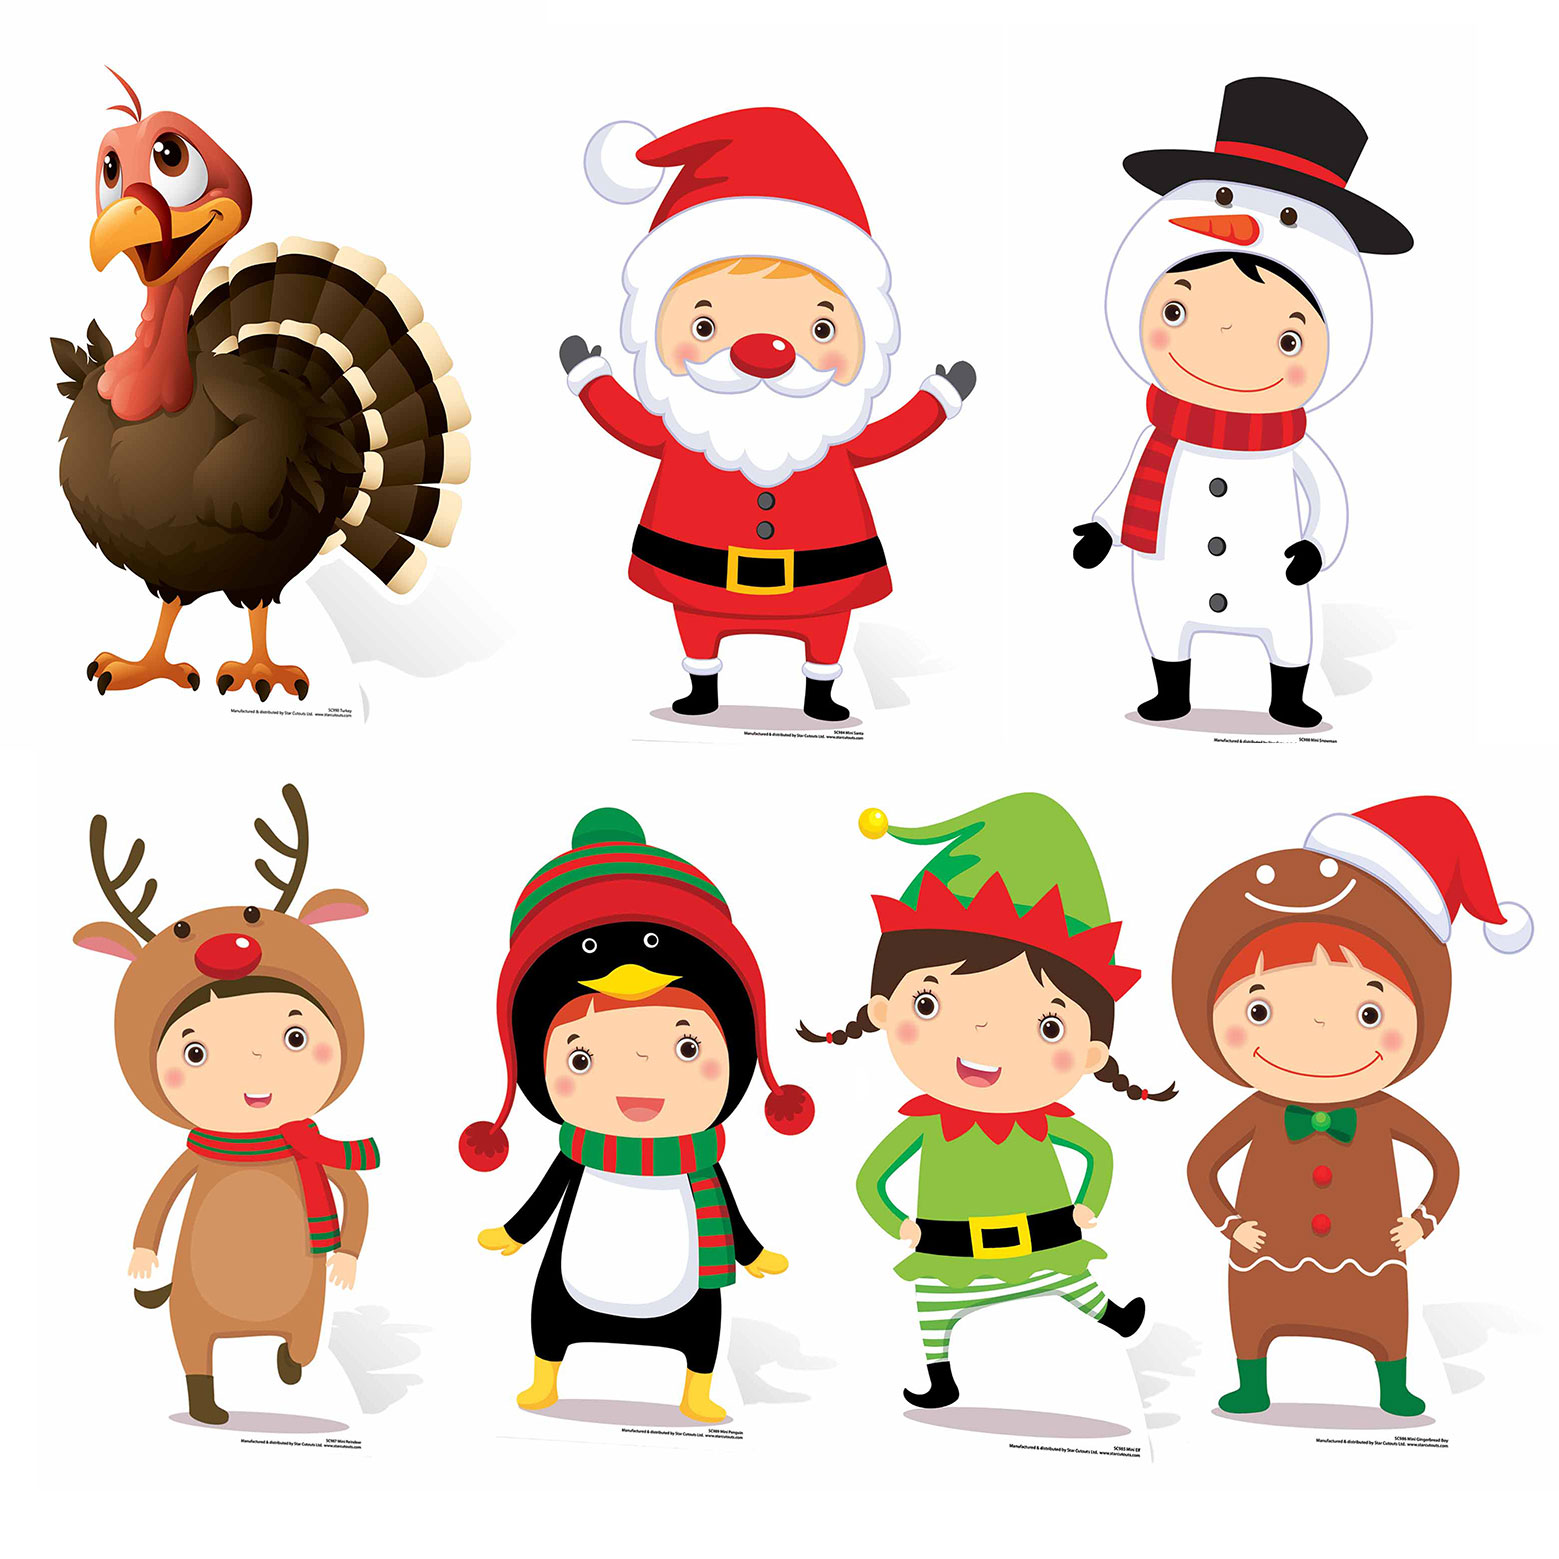 Christmas Themed Mini Cardboard Cutout Collection Set